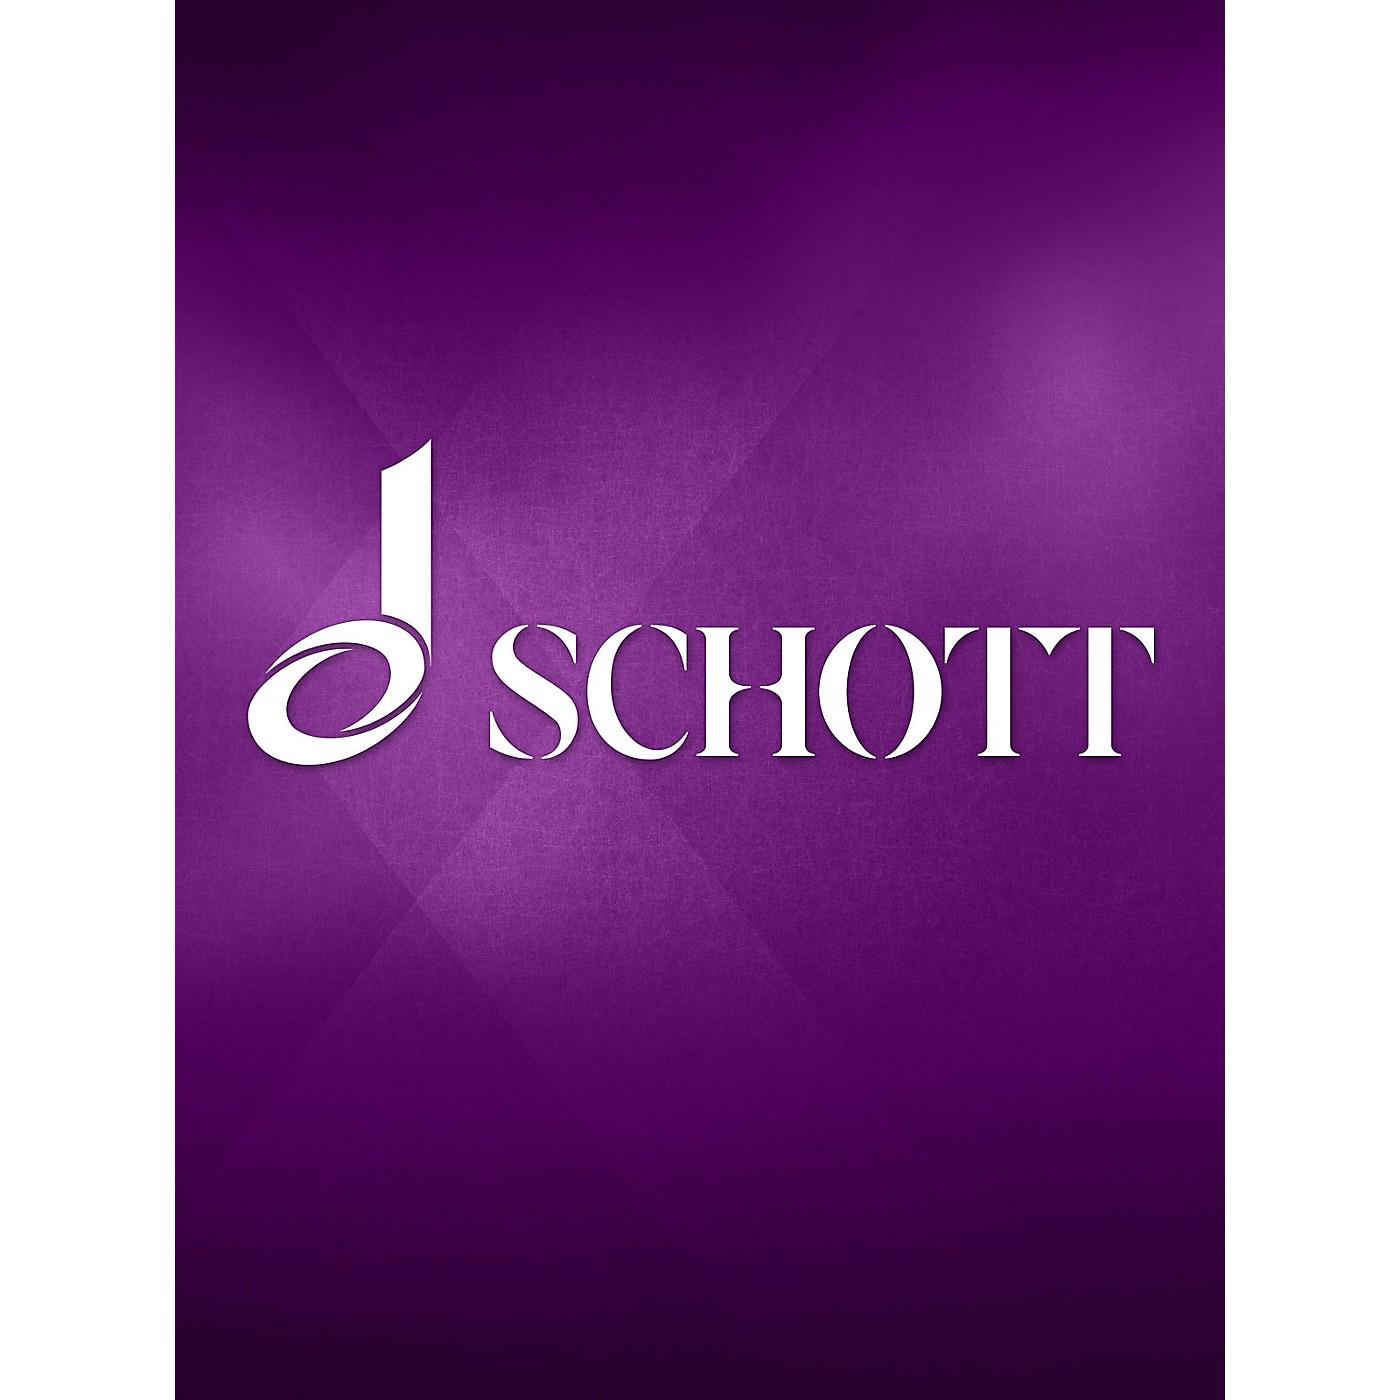 Schott First Solo Pieces - Volume 2 (Violin Solo) Schott Series thumbnail